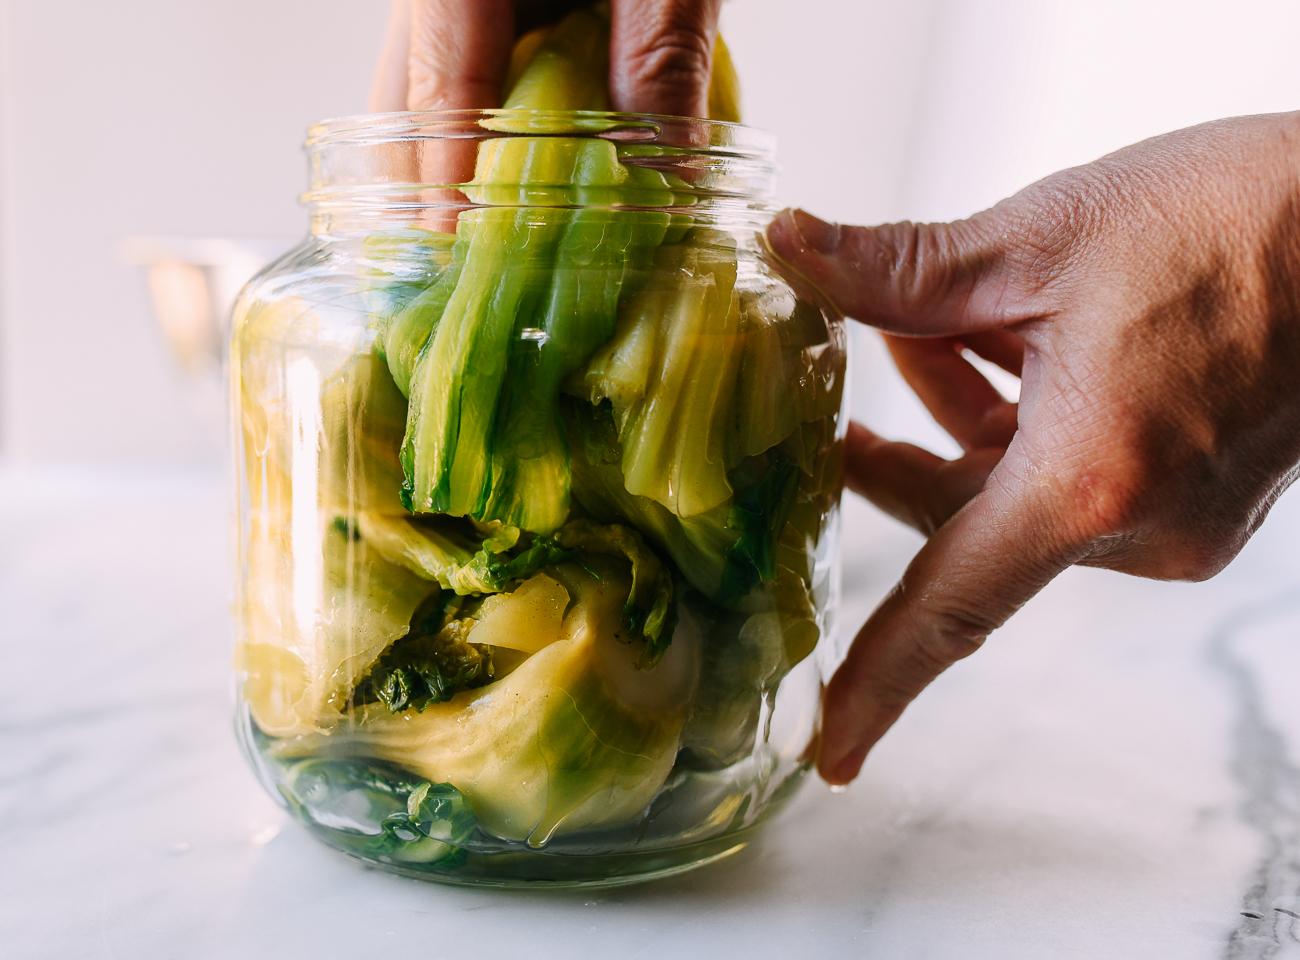 Squeezing mustard greens into pickling jar